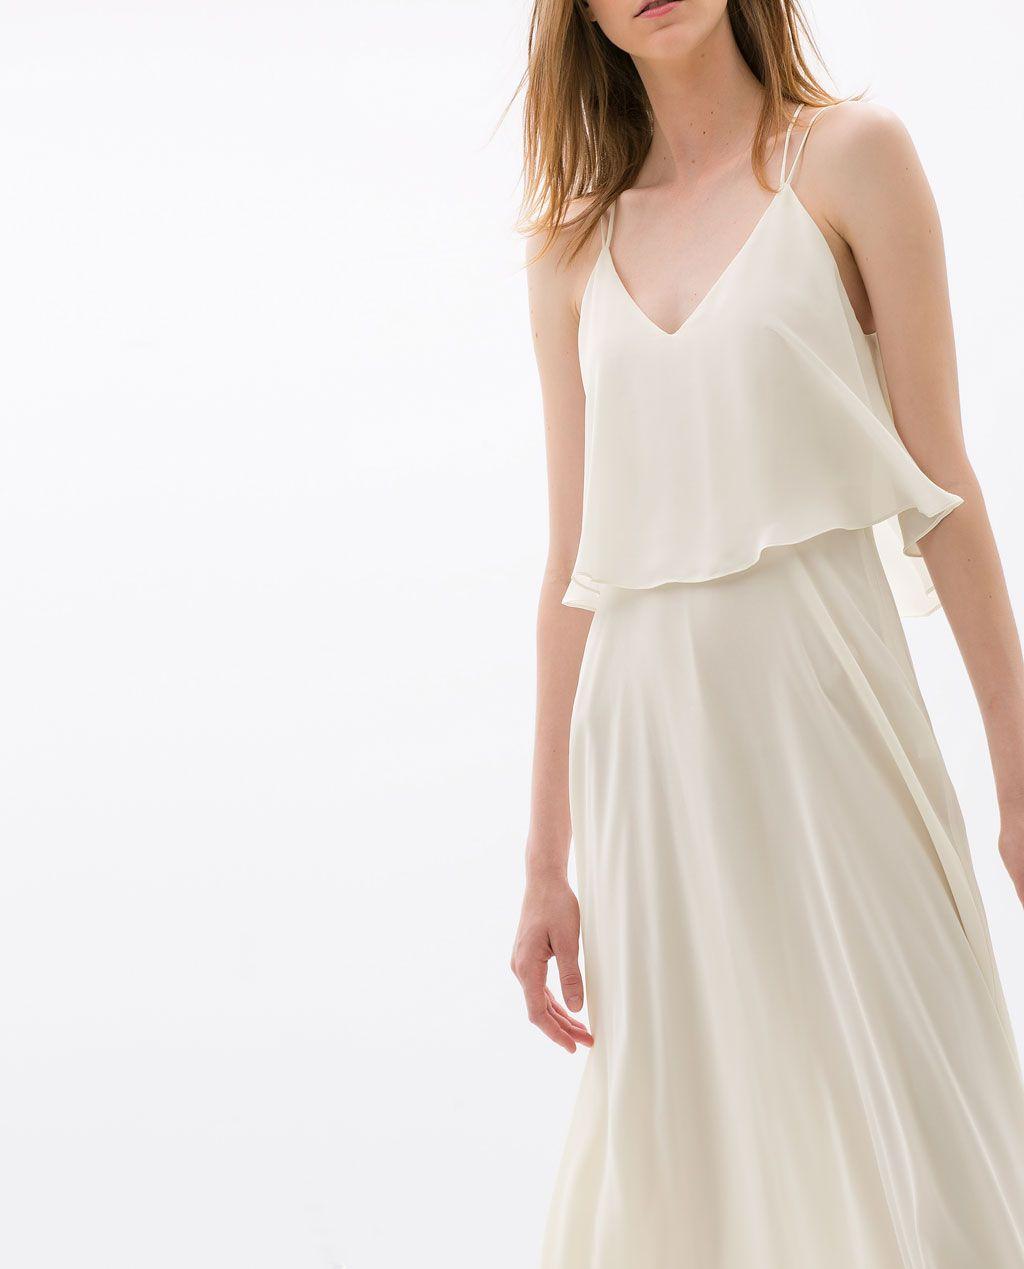 I love this flowing cream dress from Zara. Beautiful